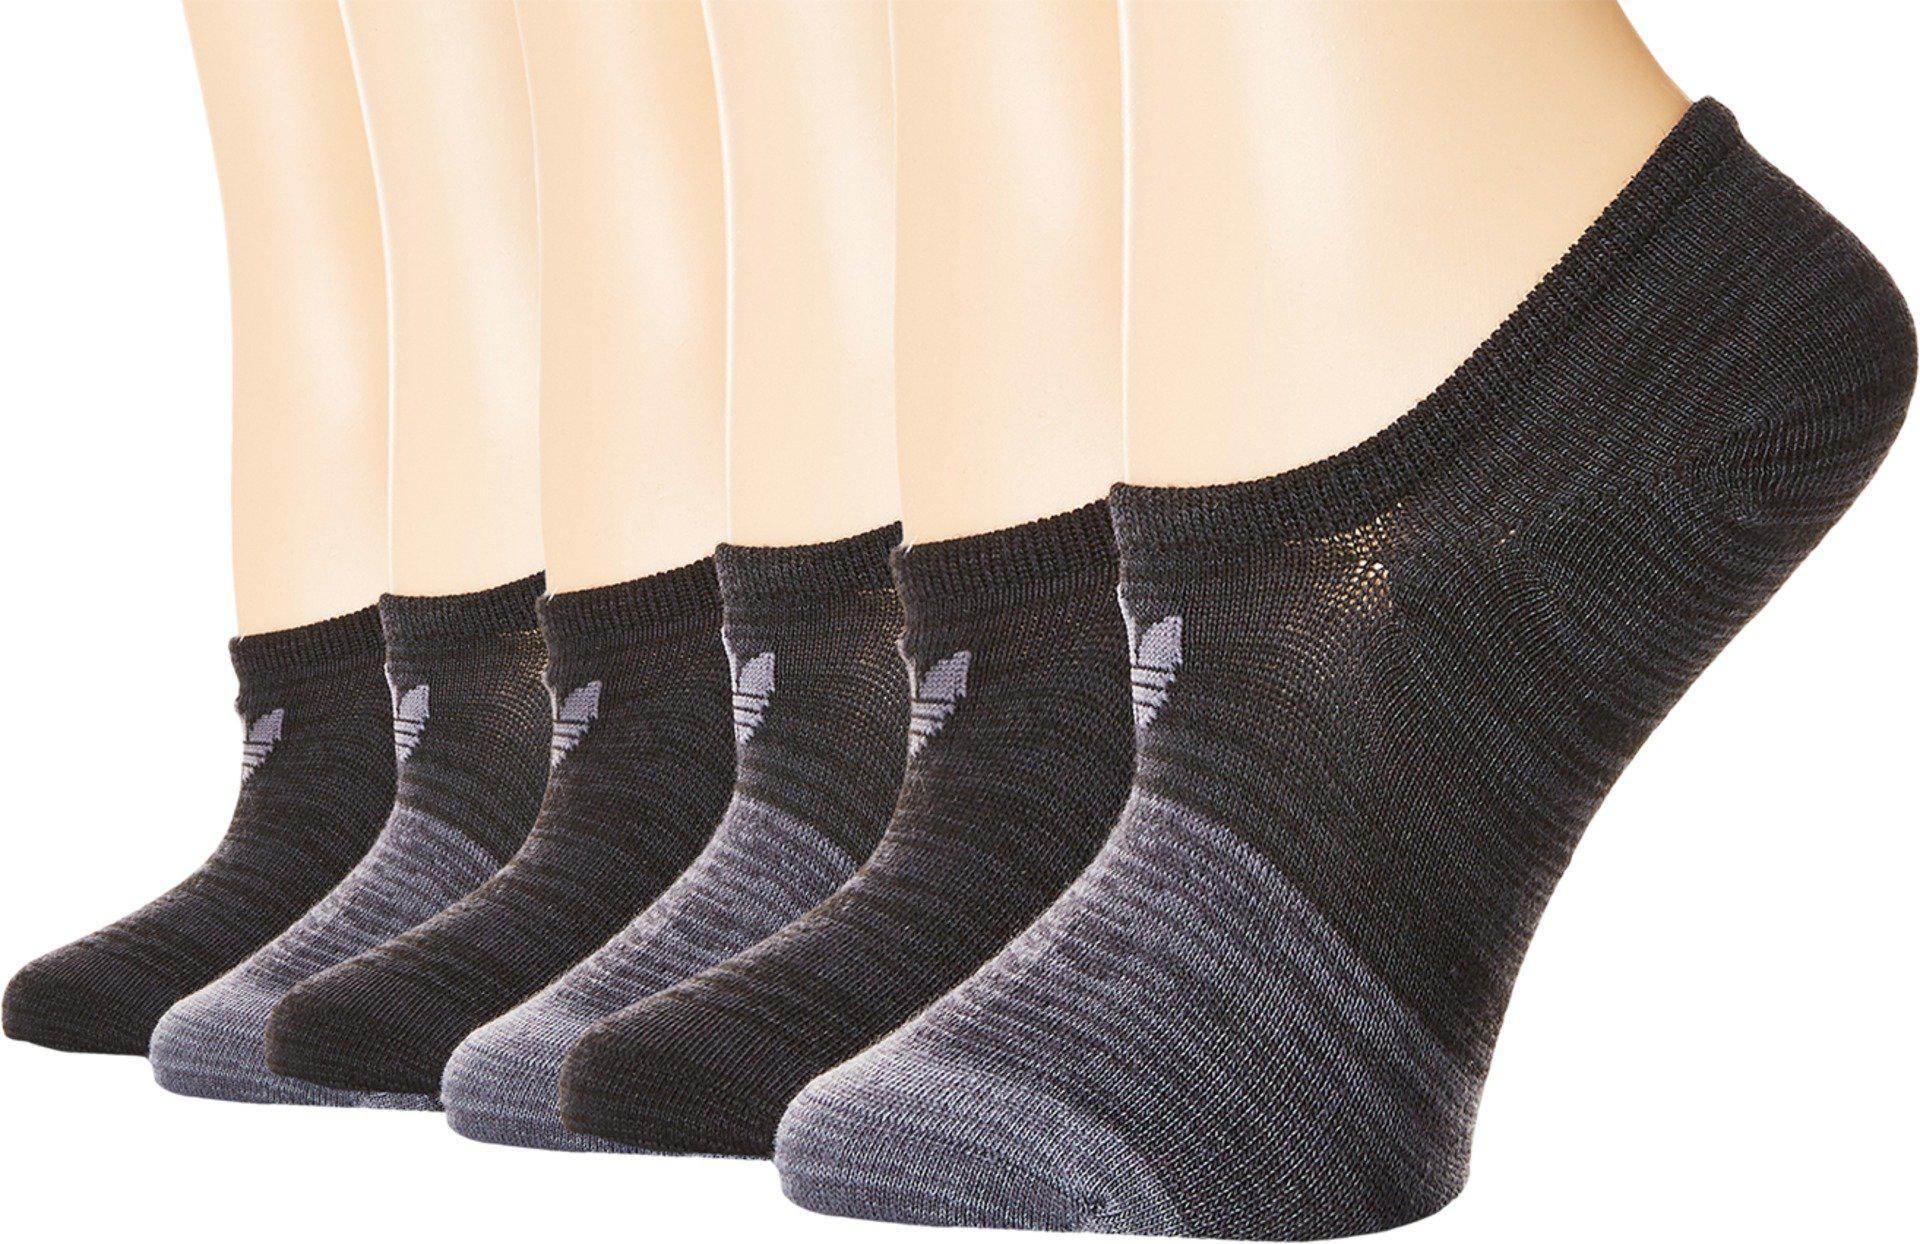 2624a28272 Women's Black Originals Blocked Space Dye Super No Show Sock 6-pack